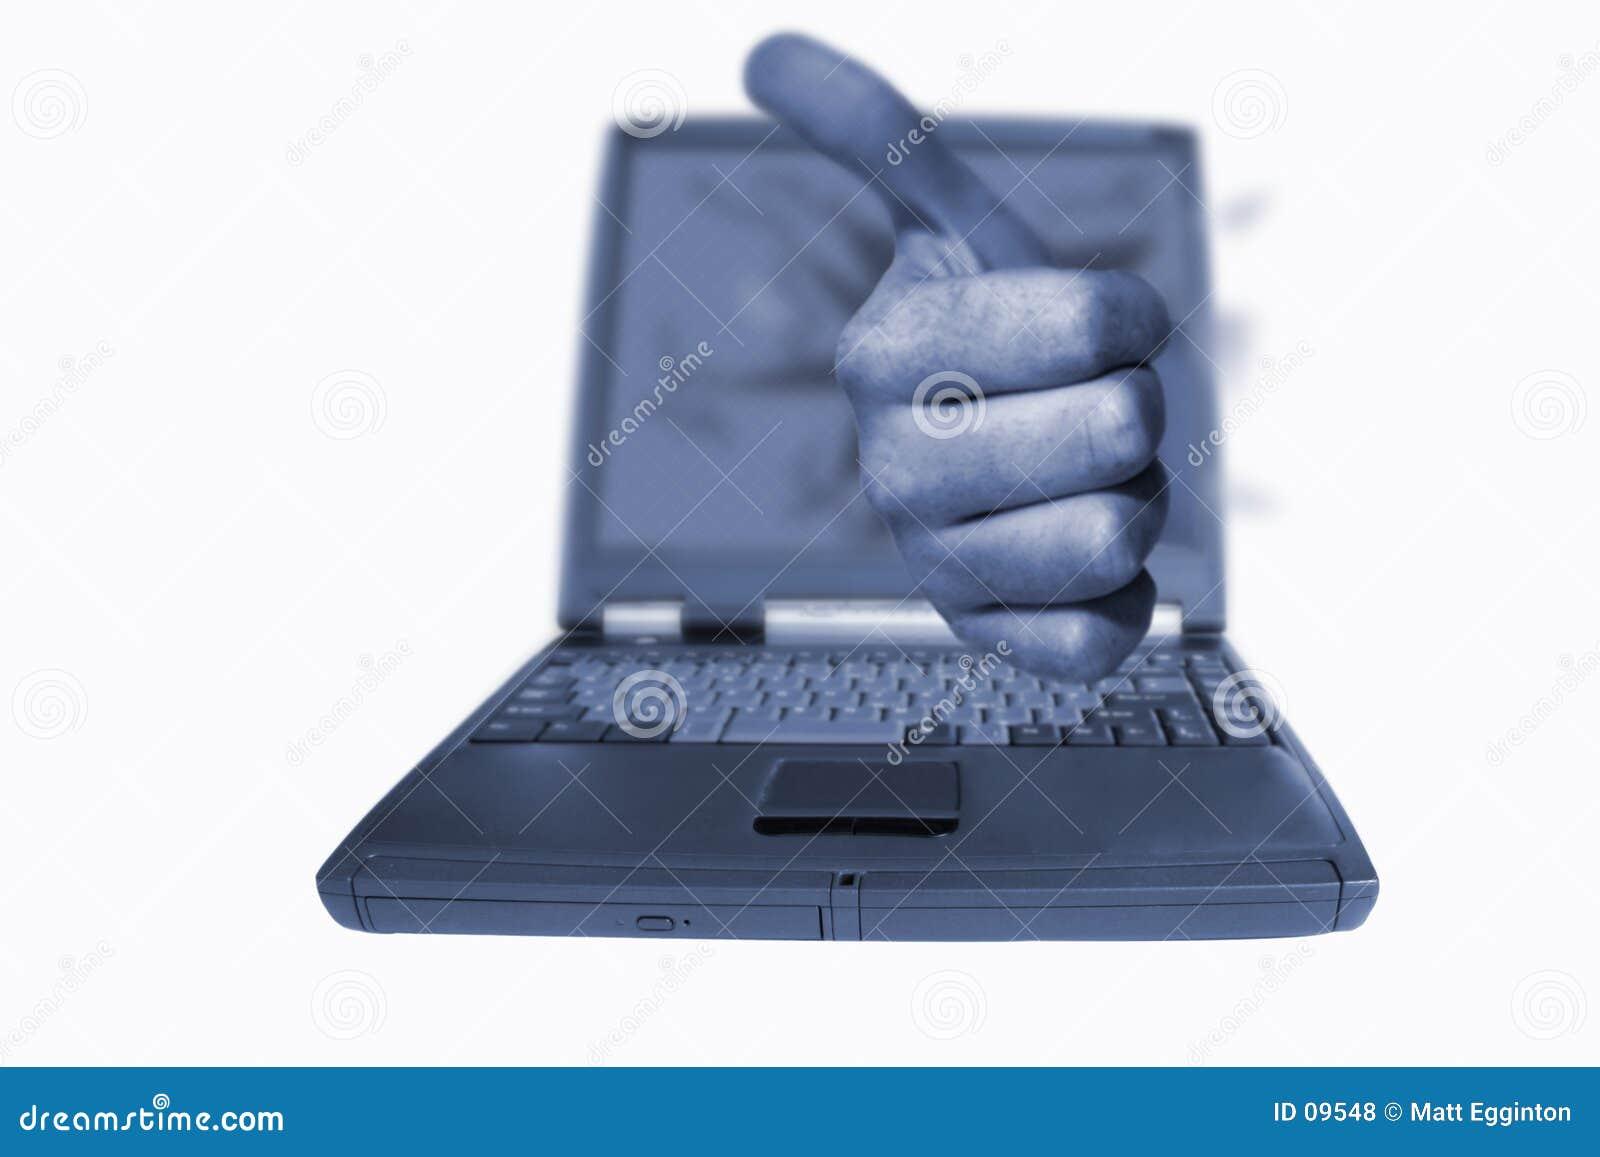 Laptop Thumbs Up